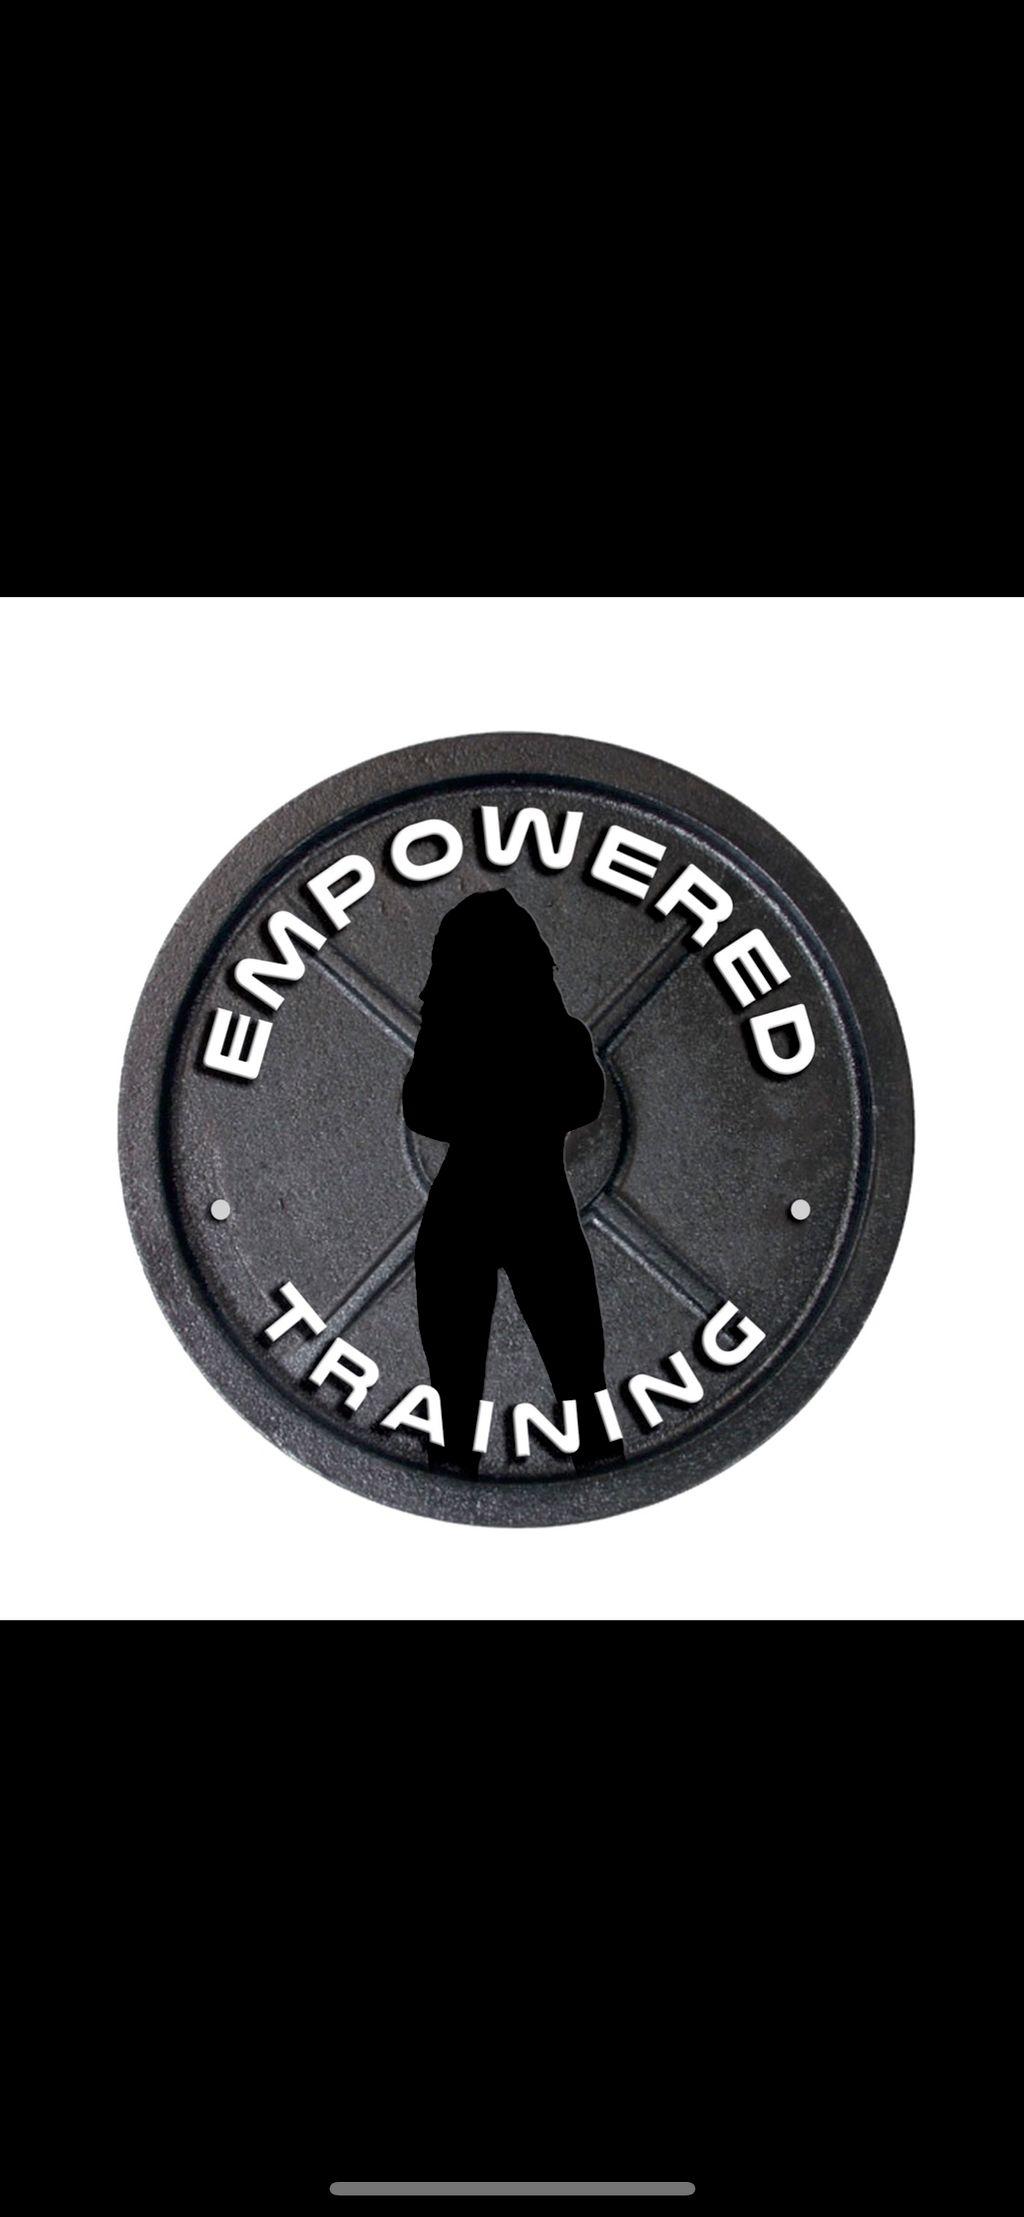 Empowered Training